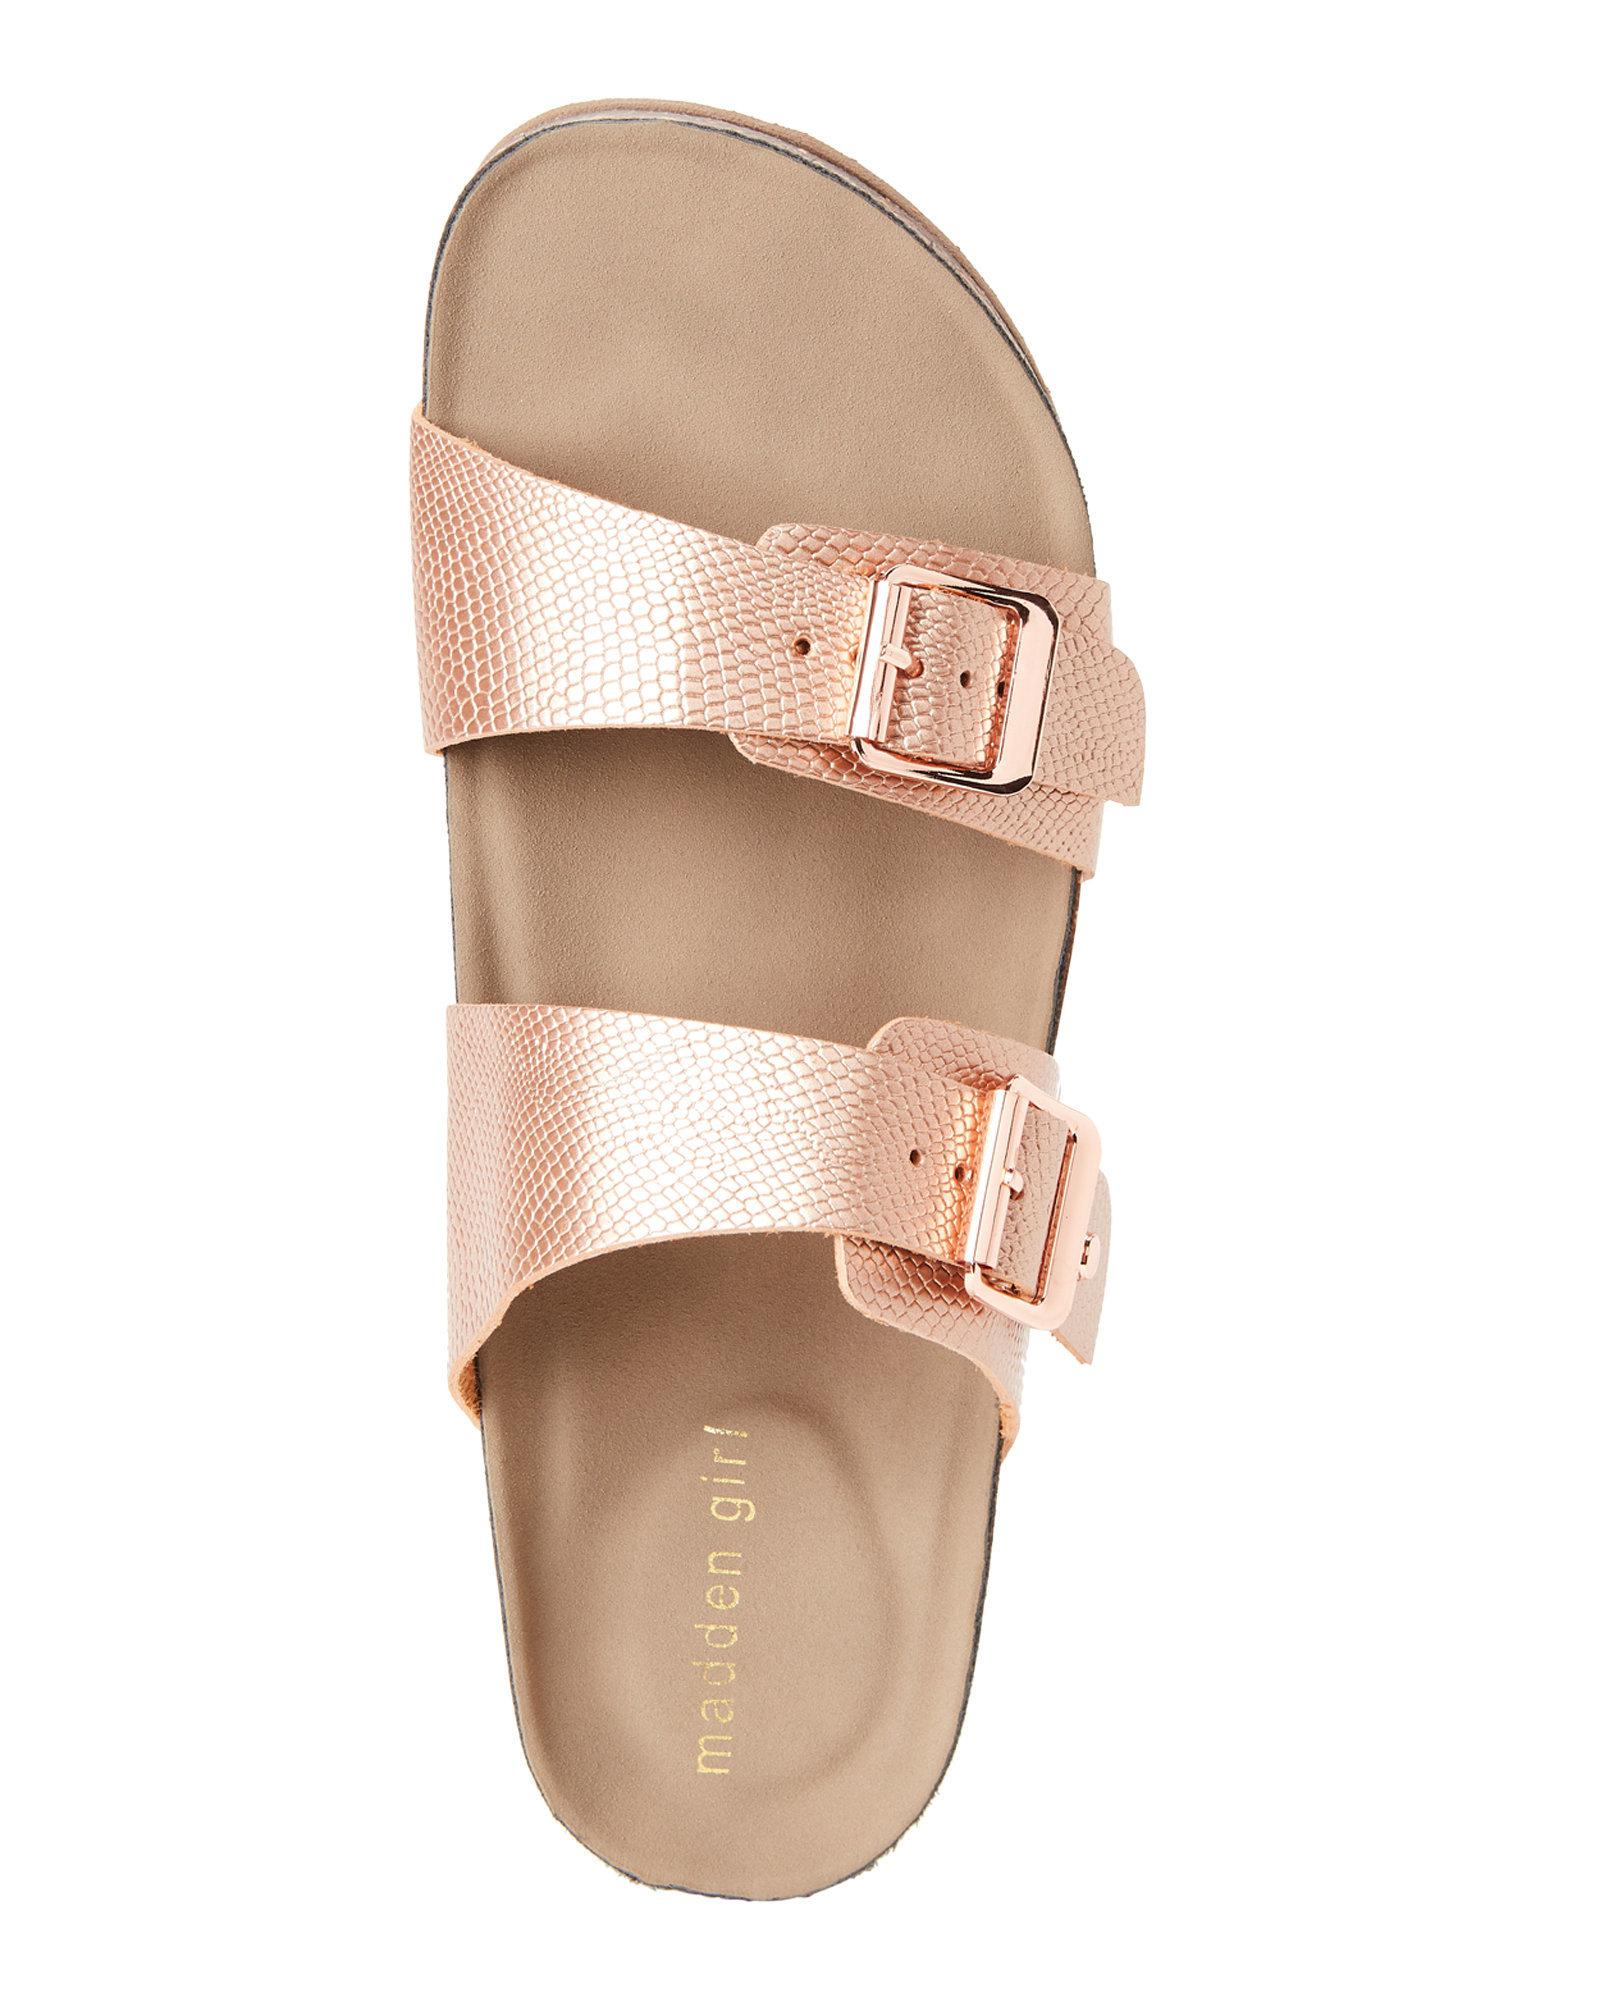 dc71c2aca47 Lyst - Madden Girl Rose Gold Brando Footbed Sandals